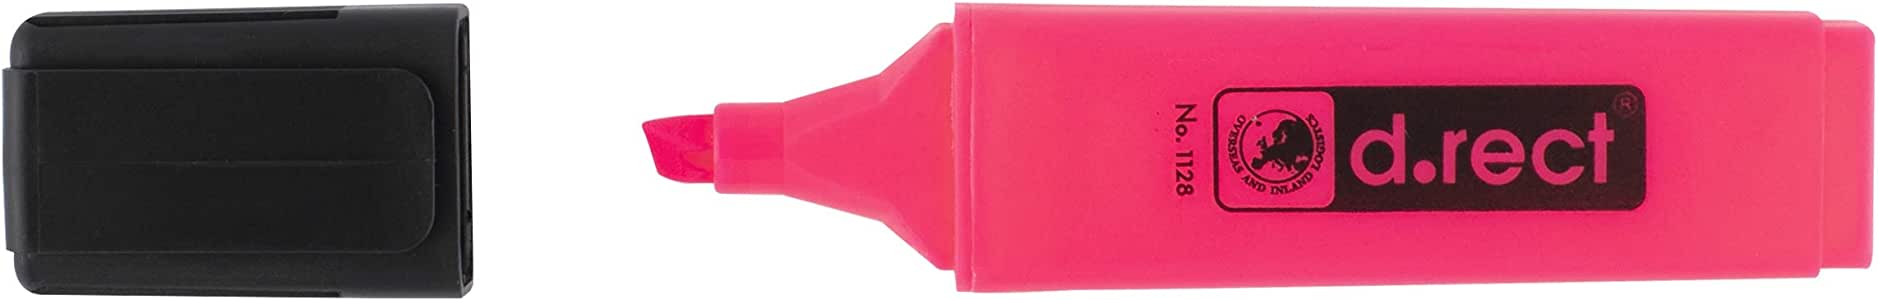 Evidenziatore D.RECT 1128 rosa